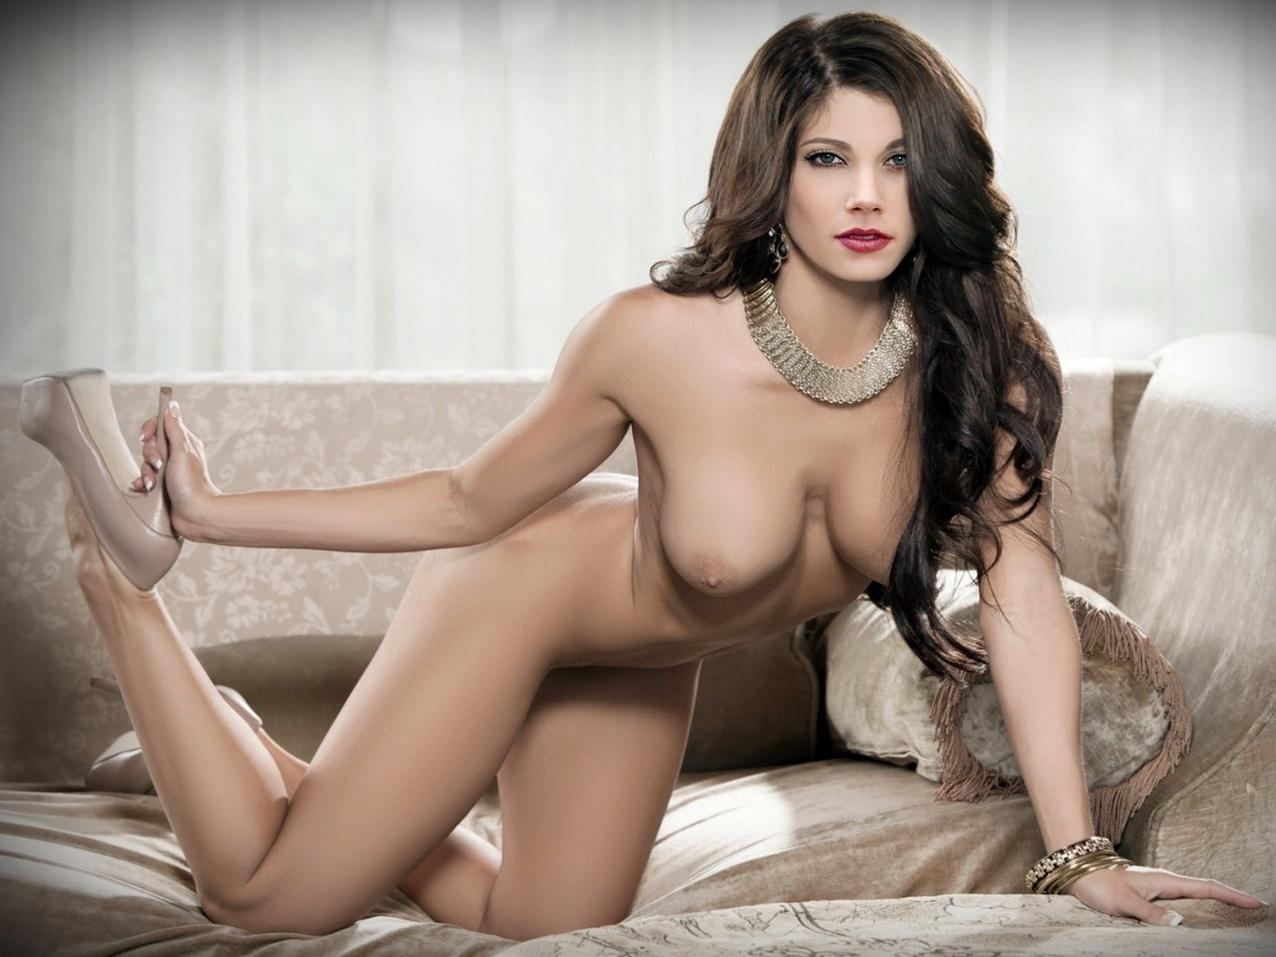 Amber mcdonald naked